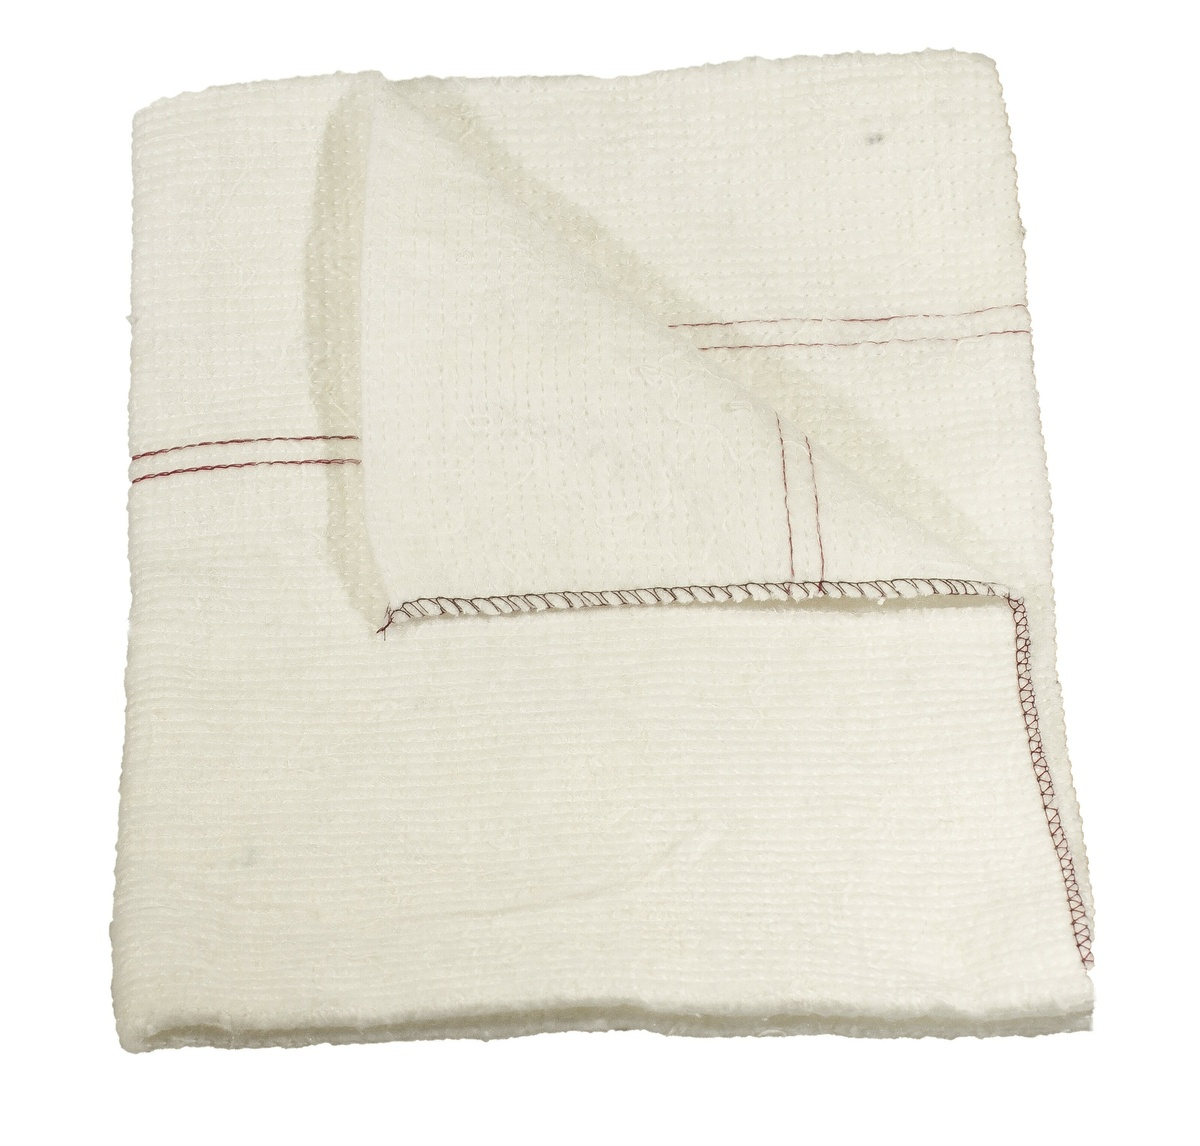 Handra na podlahu netkaná 50 x 60 cm, biela, 50 x 60 cm